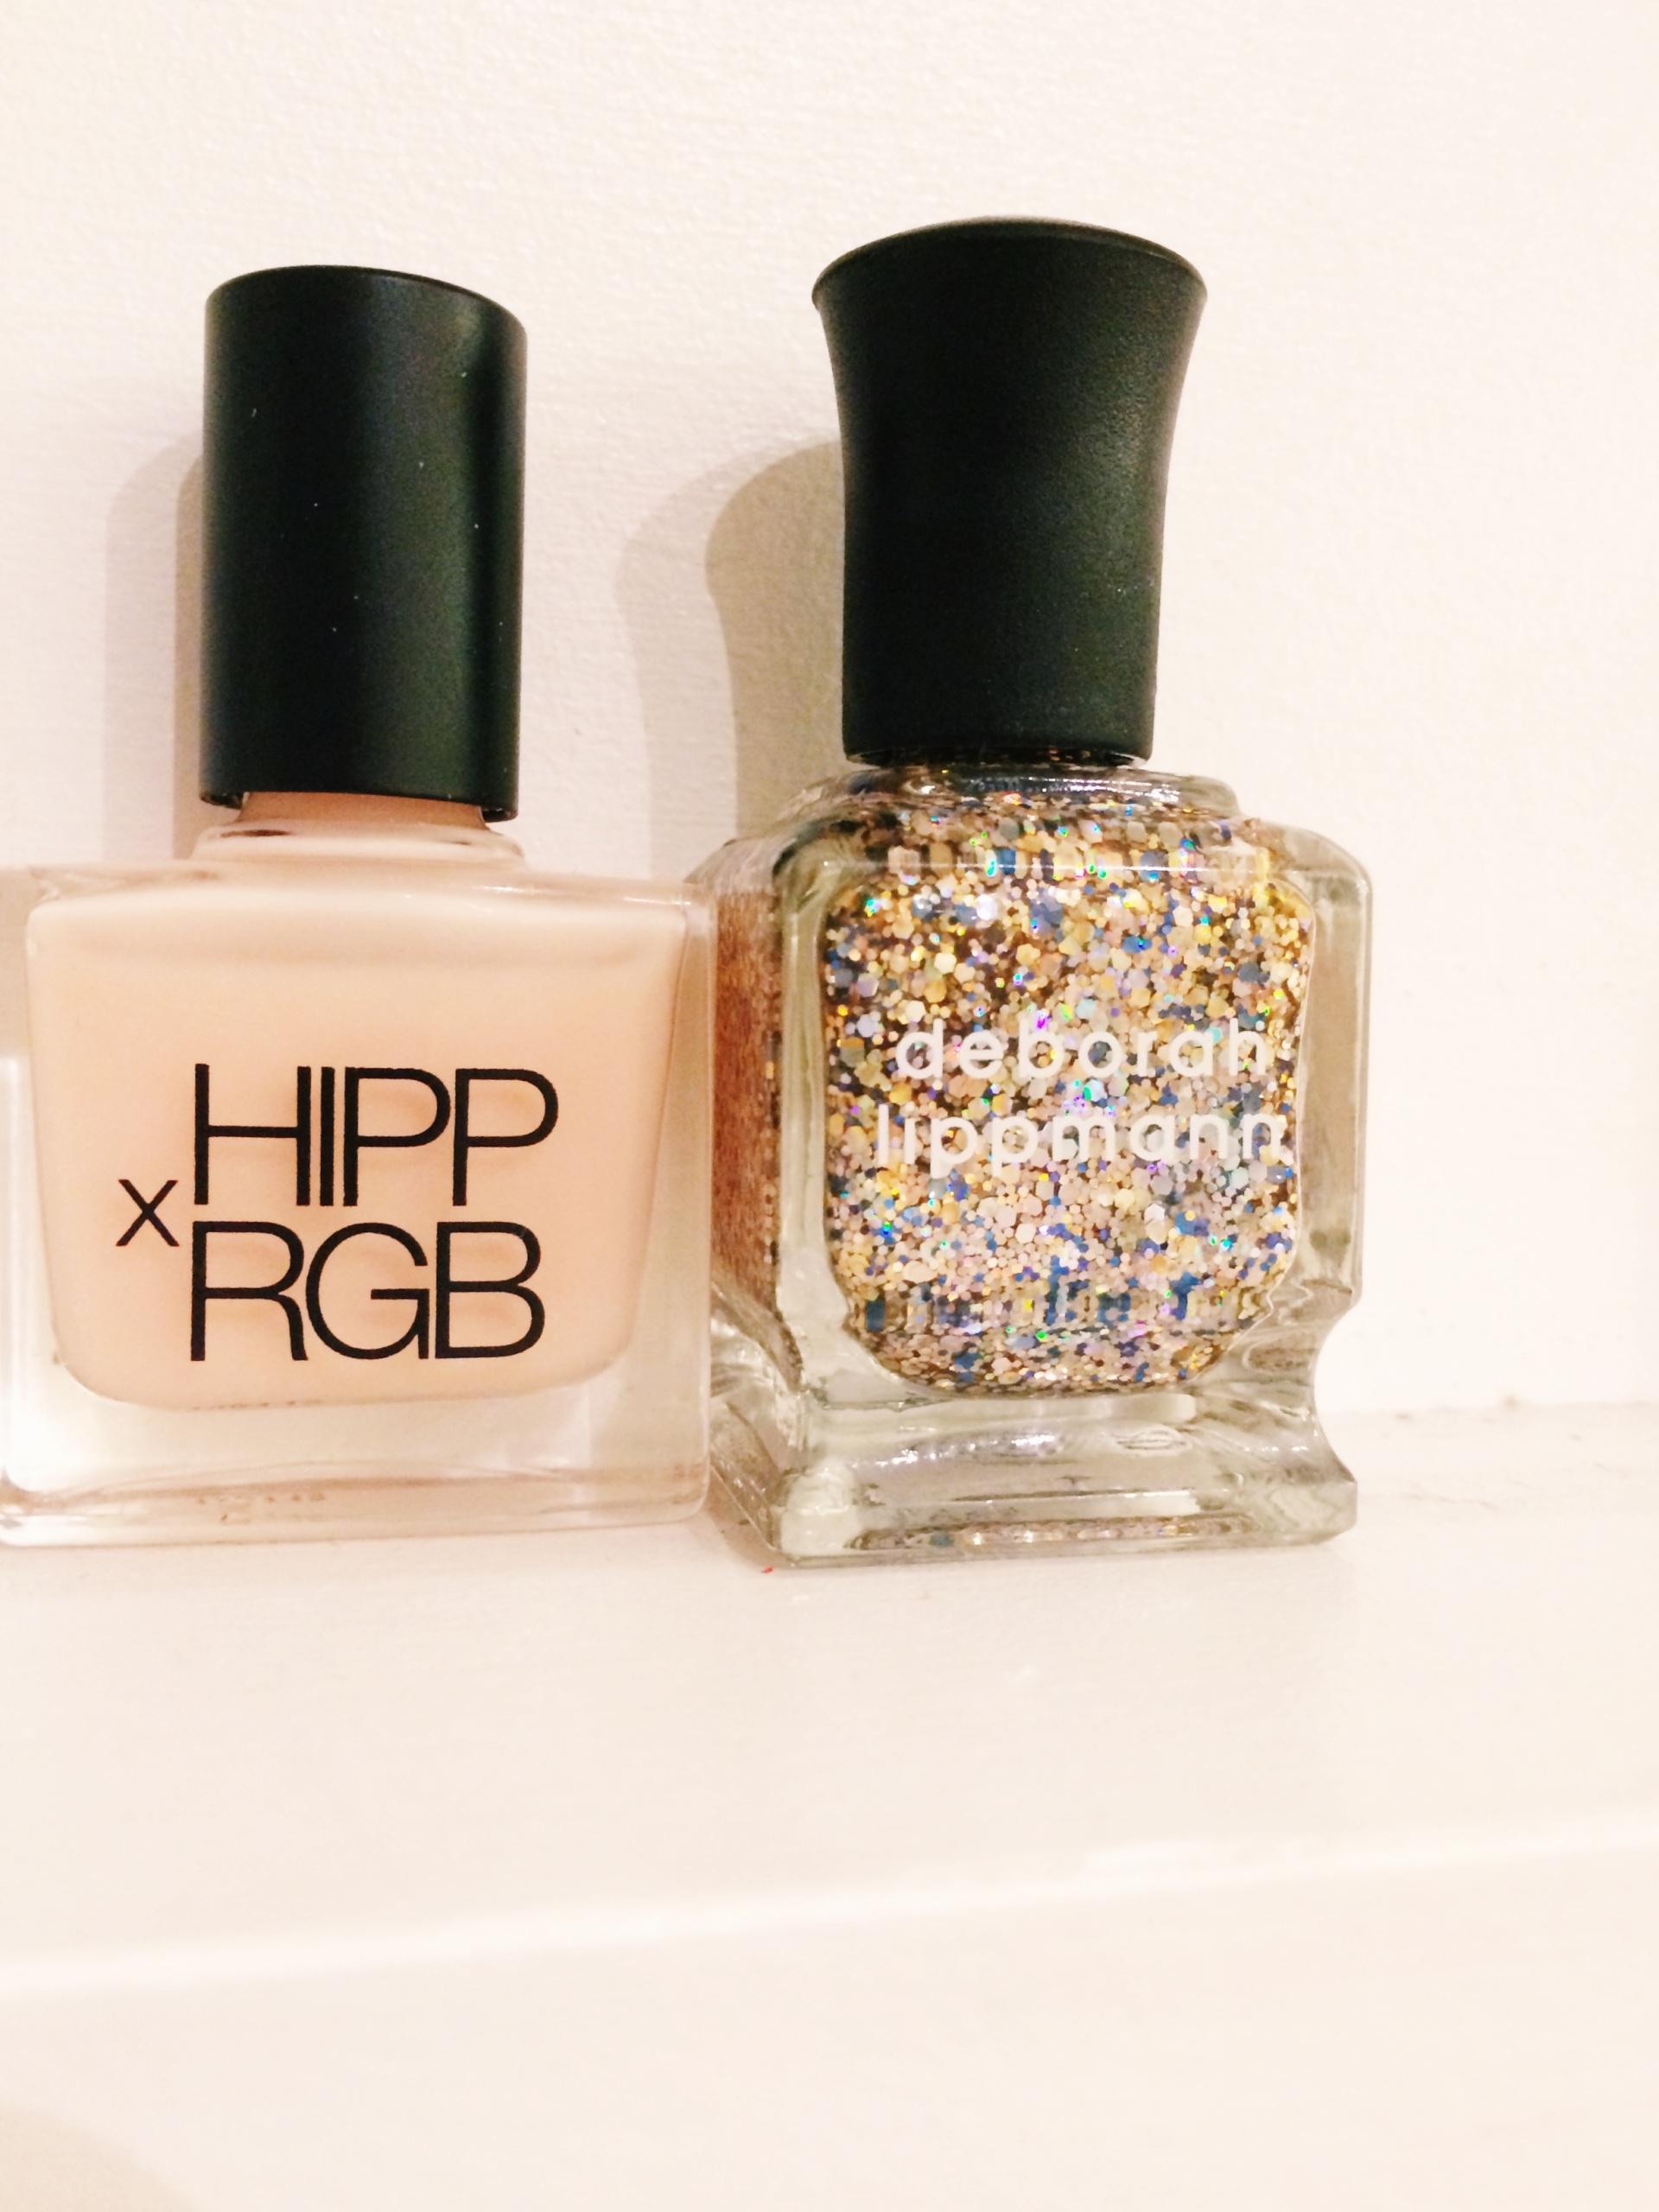 Hipp x RGB & Deborah Lippmann